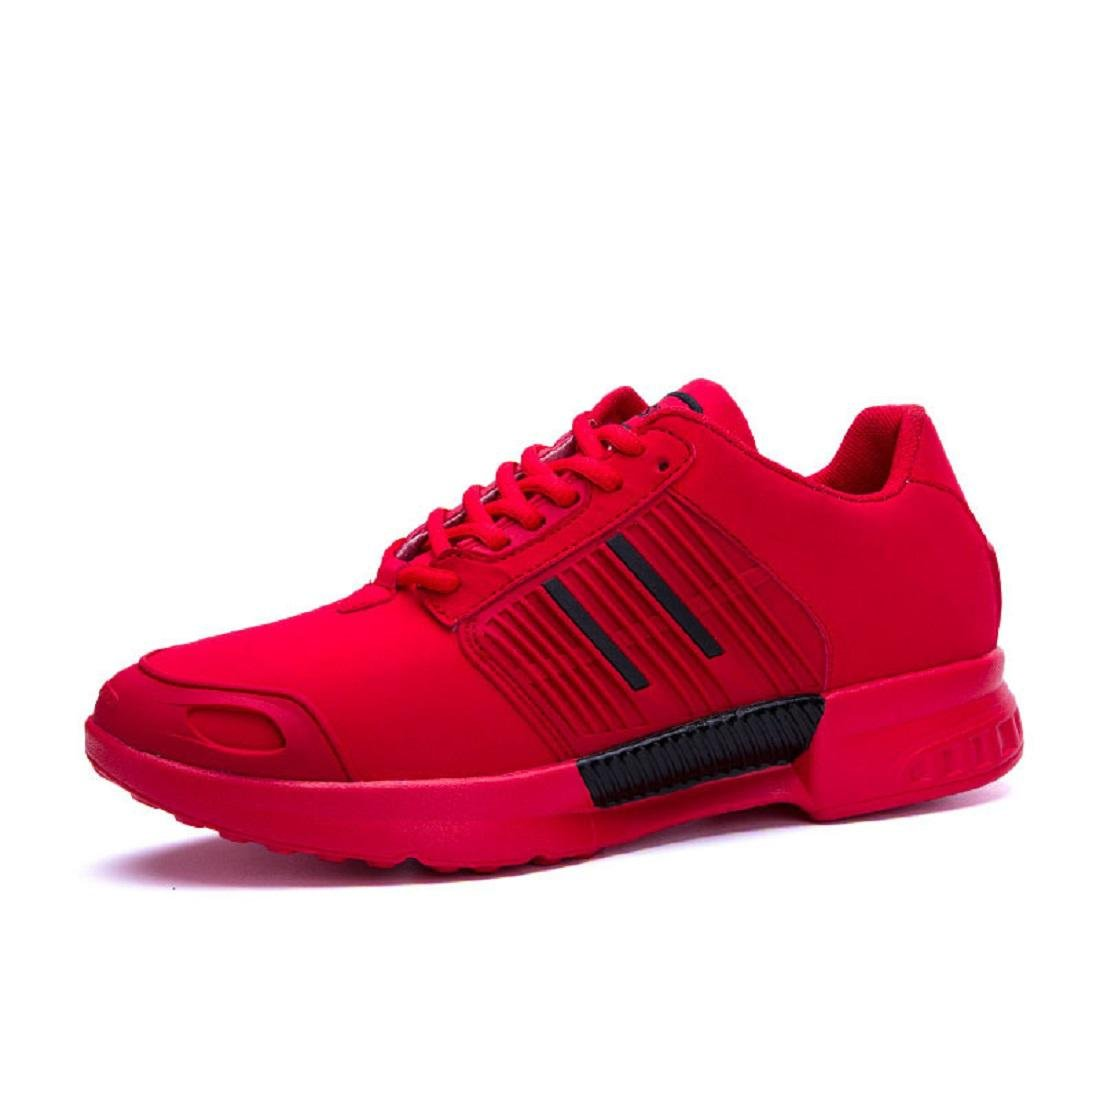 Herren Mode Sportschuhe Mode Schuhe erhöhen Lässige Schuhe Draussen Trainer Schutzfuß Rutschfest EUR GRÖSSE 39-44